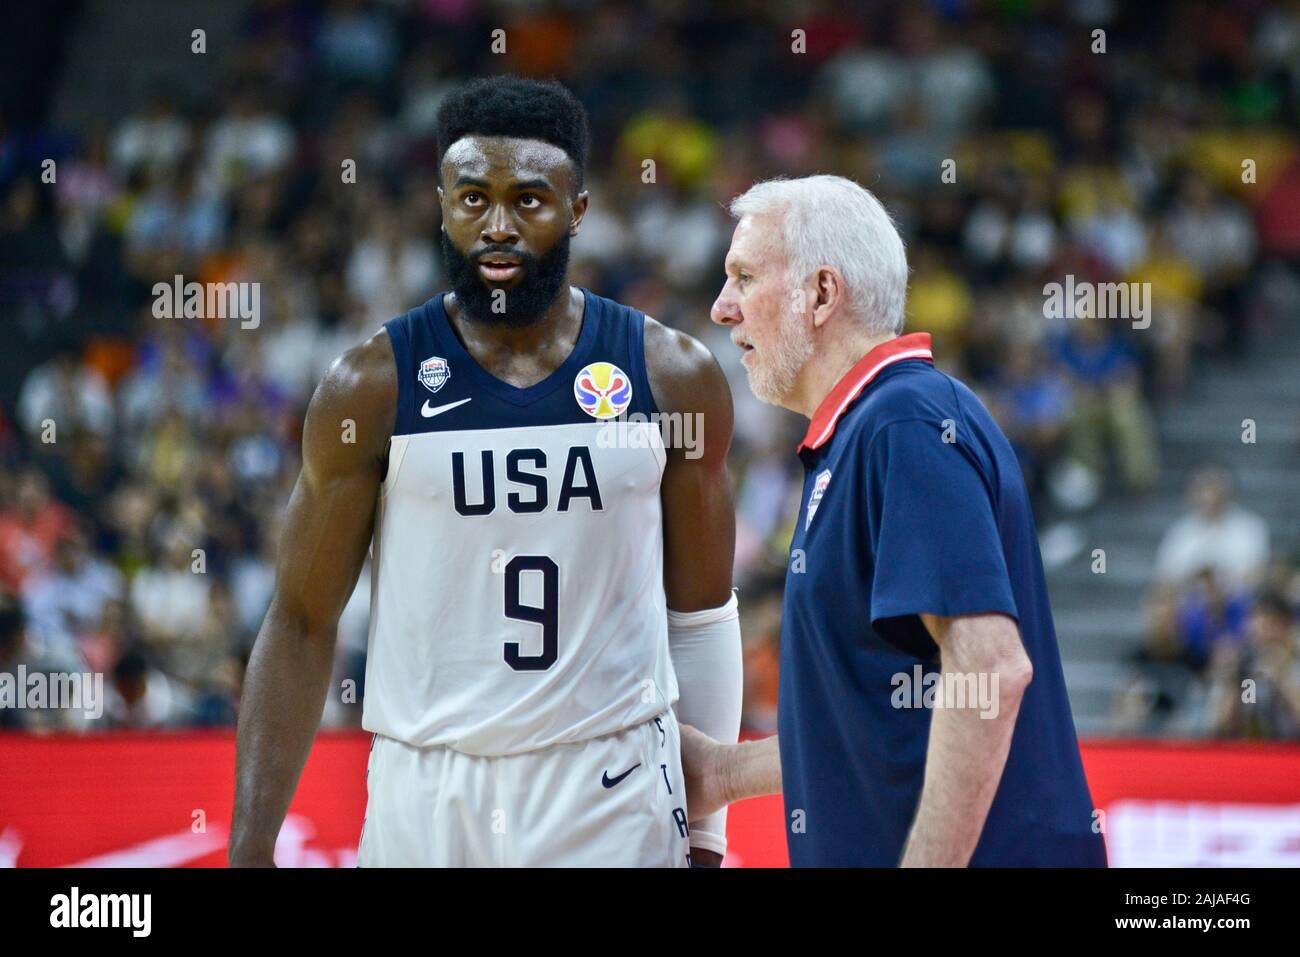 Gregg Popovich Talks To Jaylen Brown Usa Vs France Fiba Basketball World Cup China 2019 Qua Stock Photo Alamy